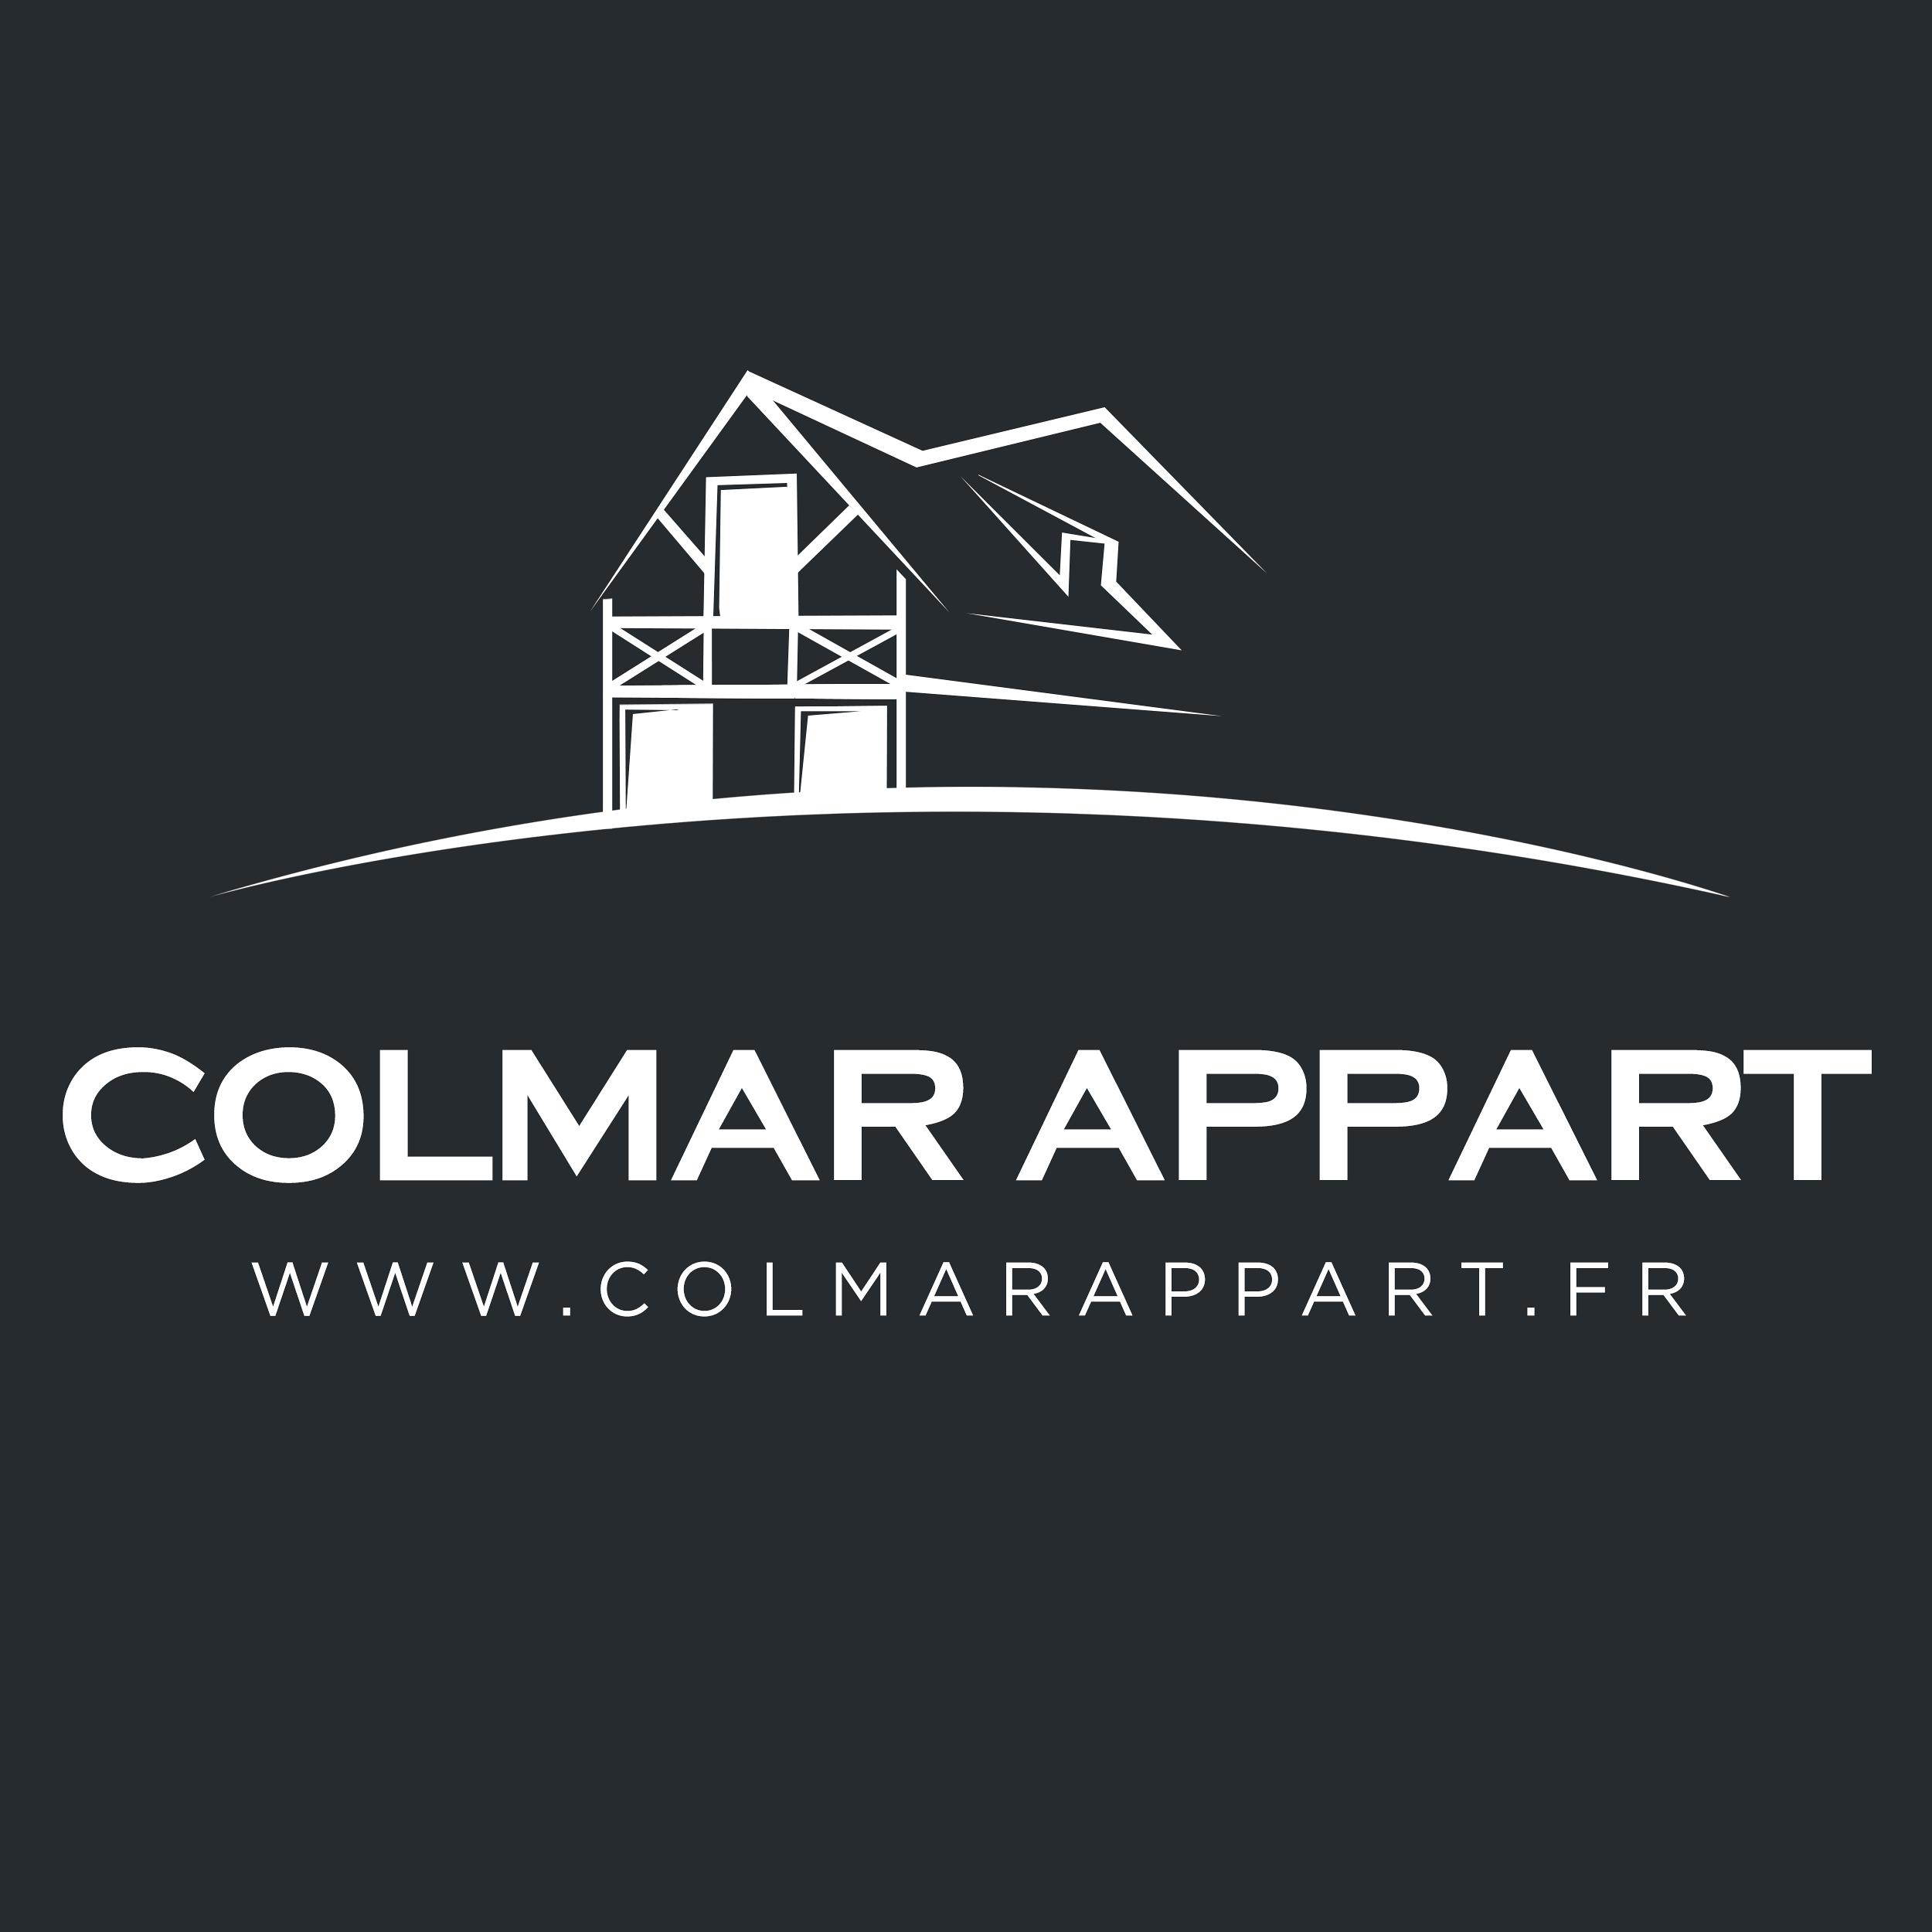 Location Appart Colmar